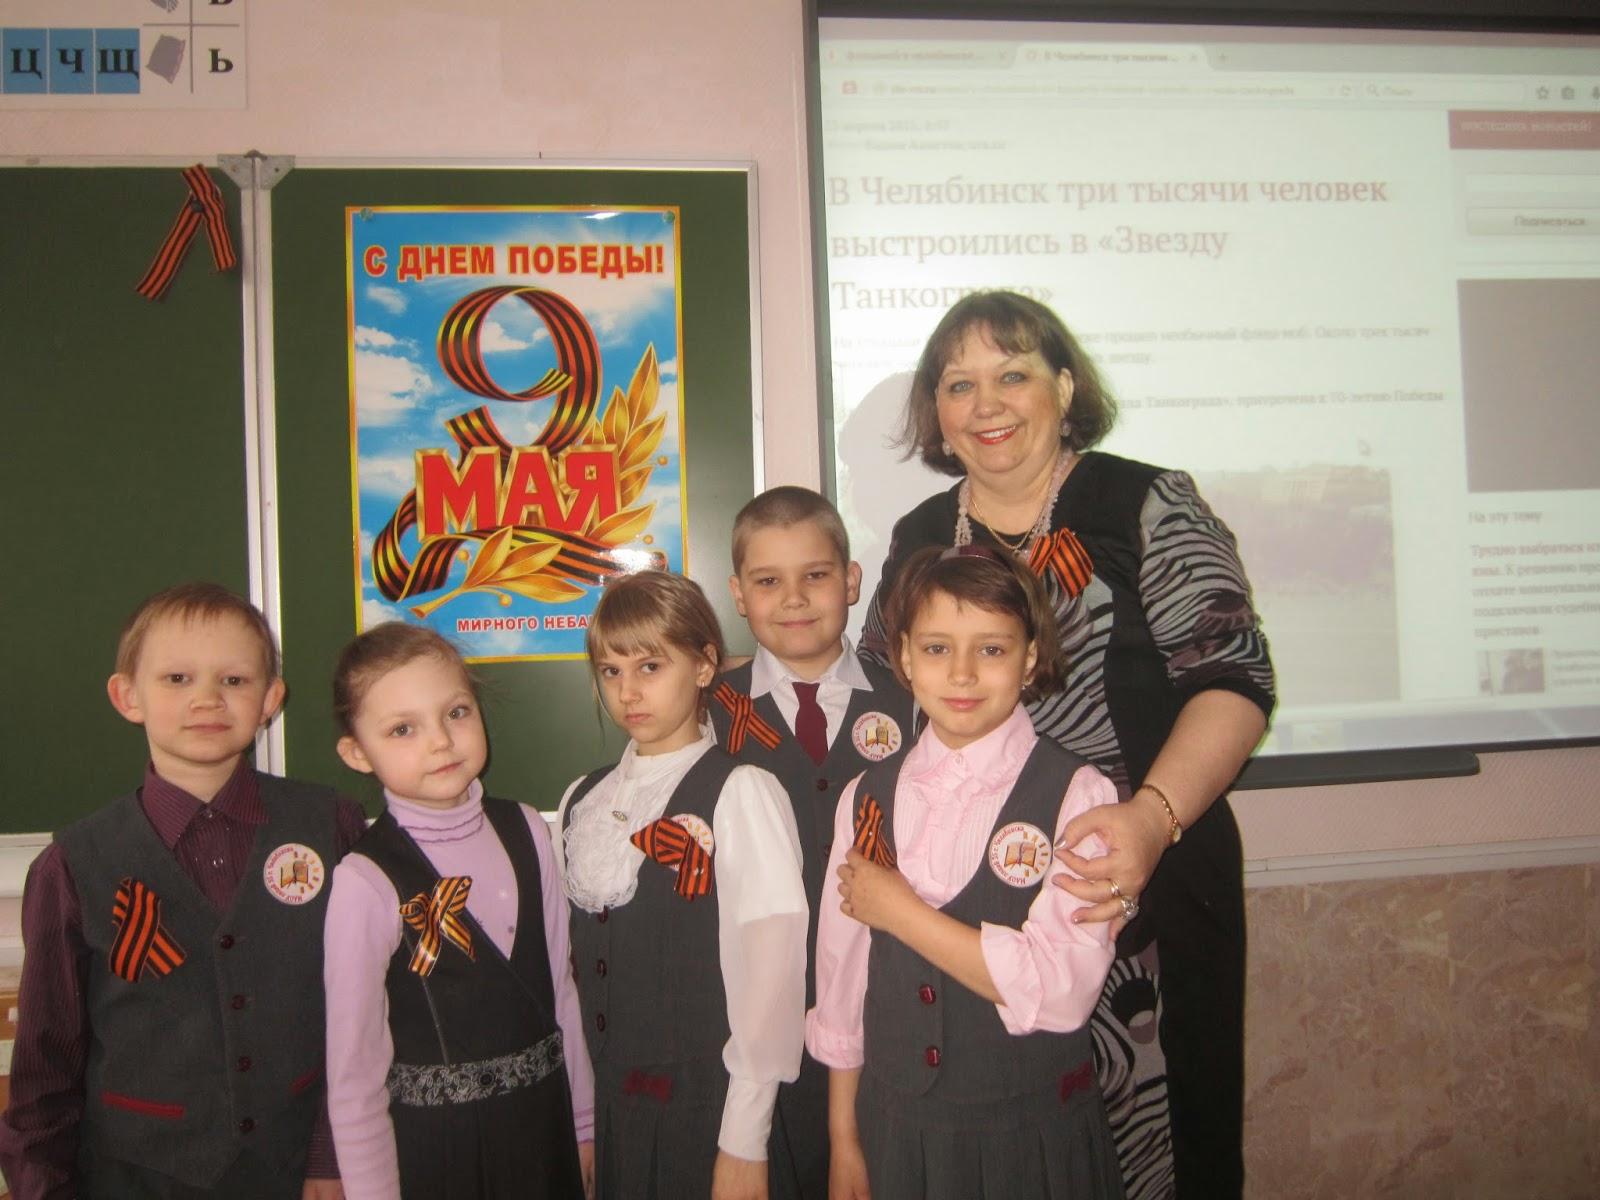 презентация для девочки 5 6 лет на конкурс